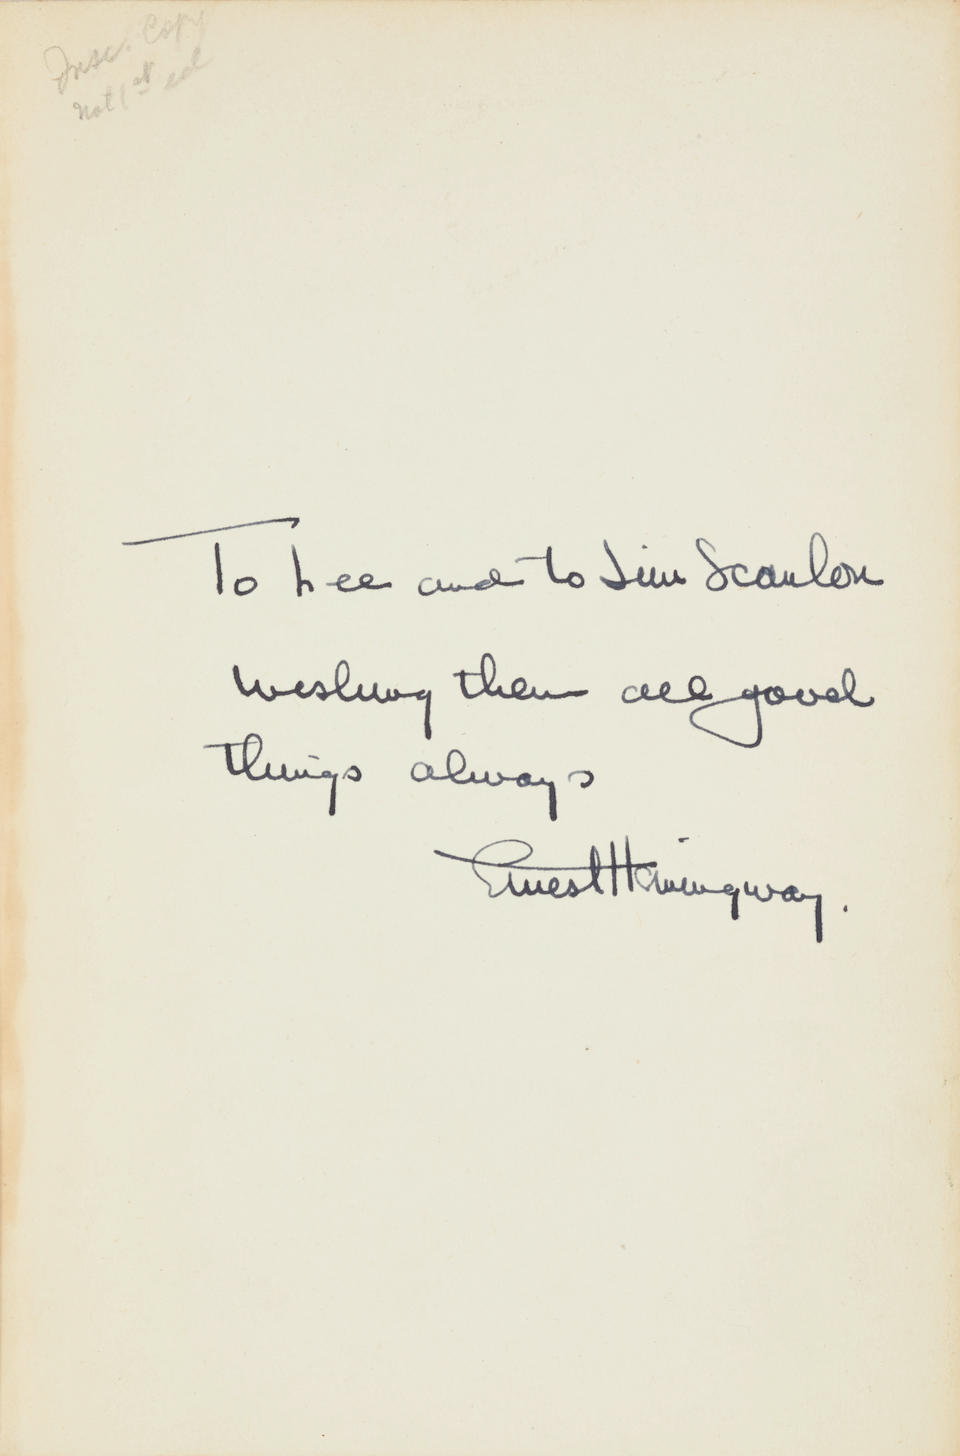 HEMINGWAY, ERNEST. 1899-1961. For Whom the Bell Tolls.  New York: Scribner's, 1945.